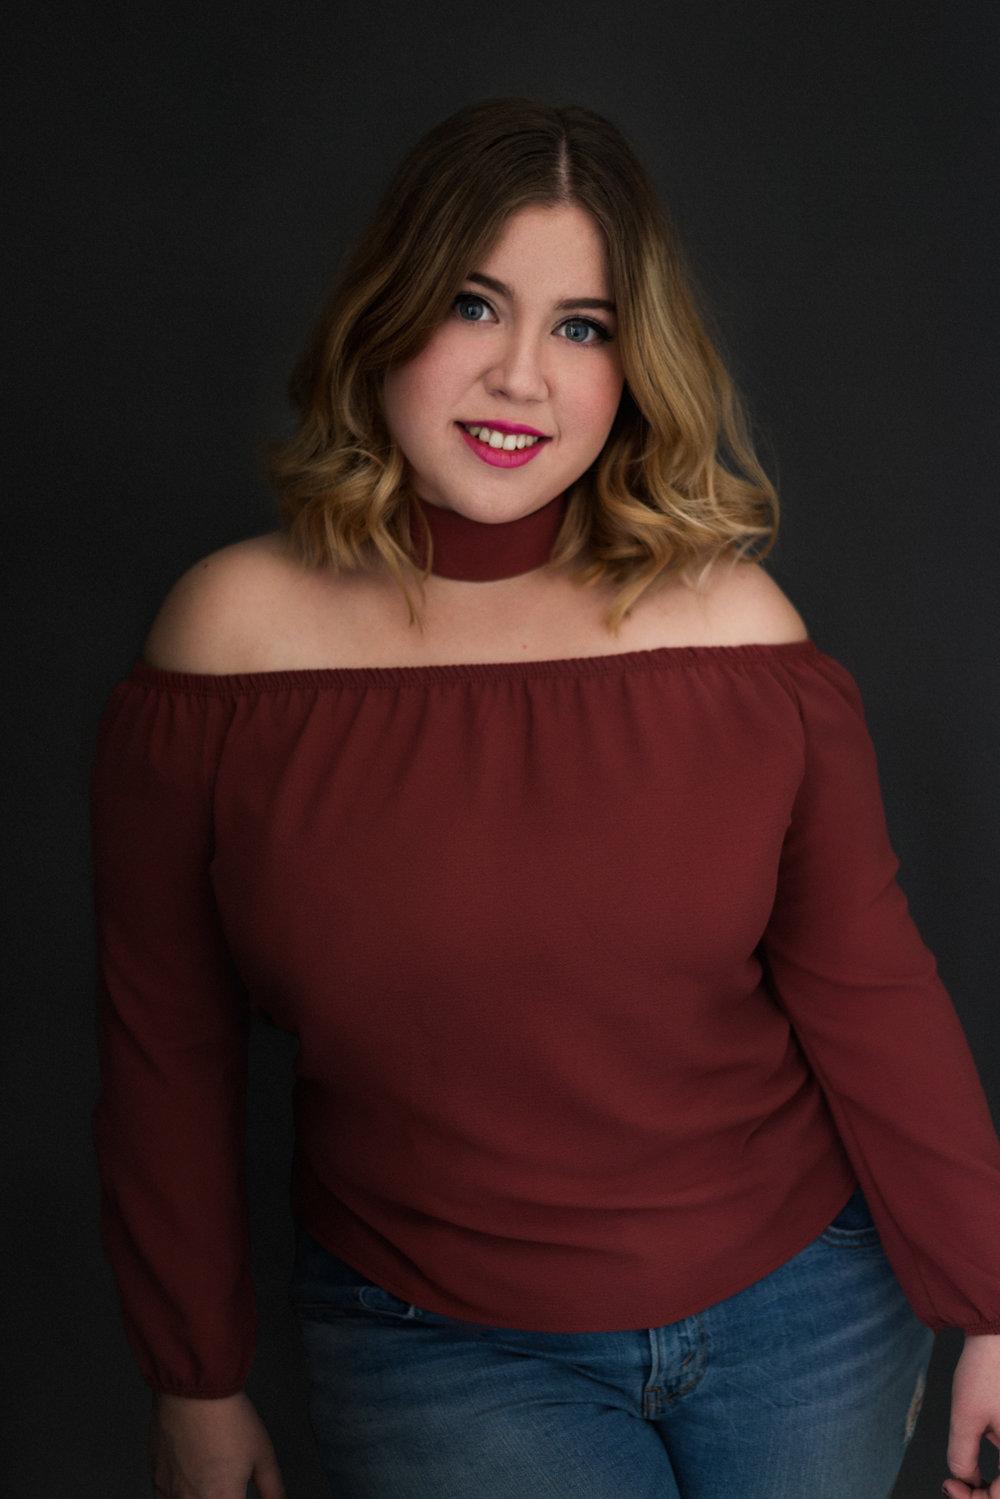 Diana-Melissa Alcantar Fotografía-Sesión de fotos en Mexicali